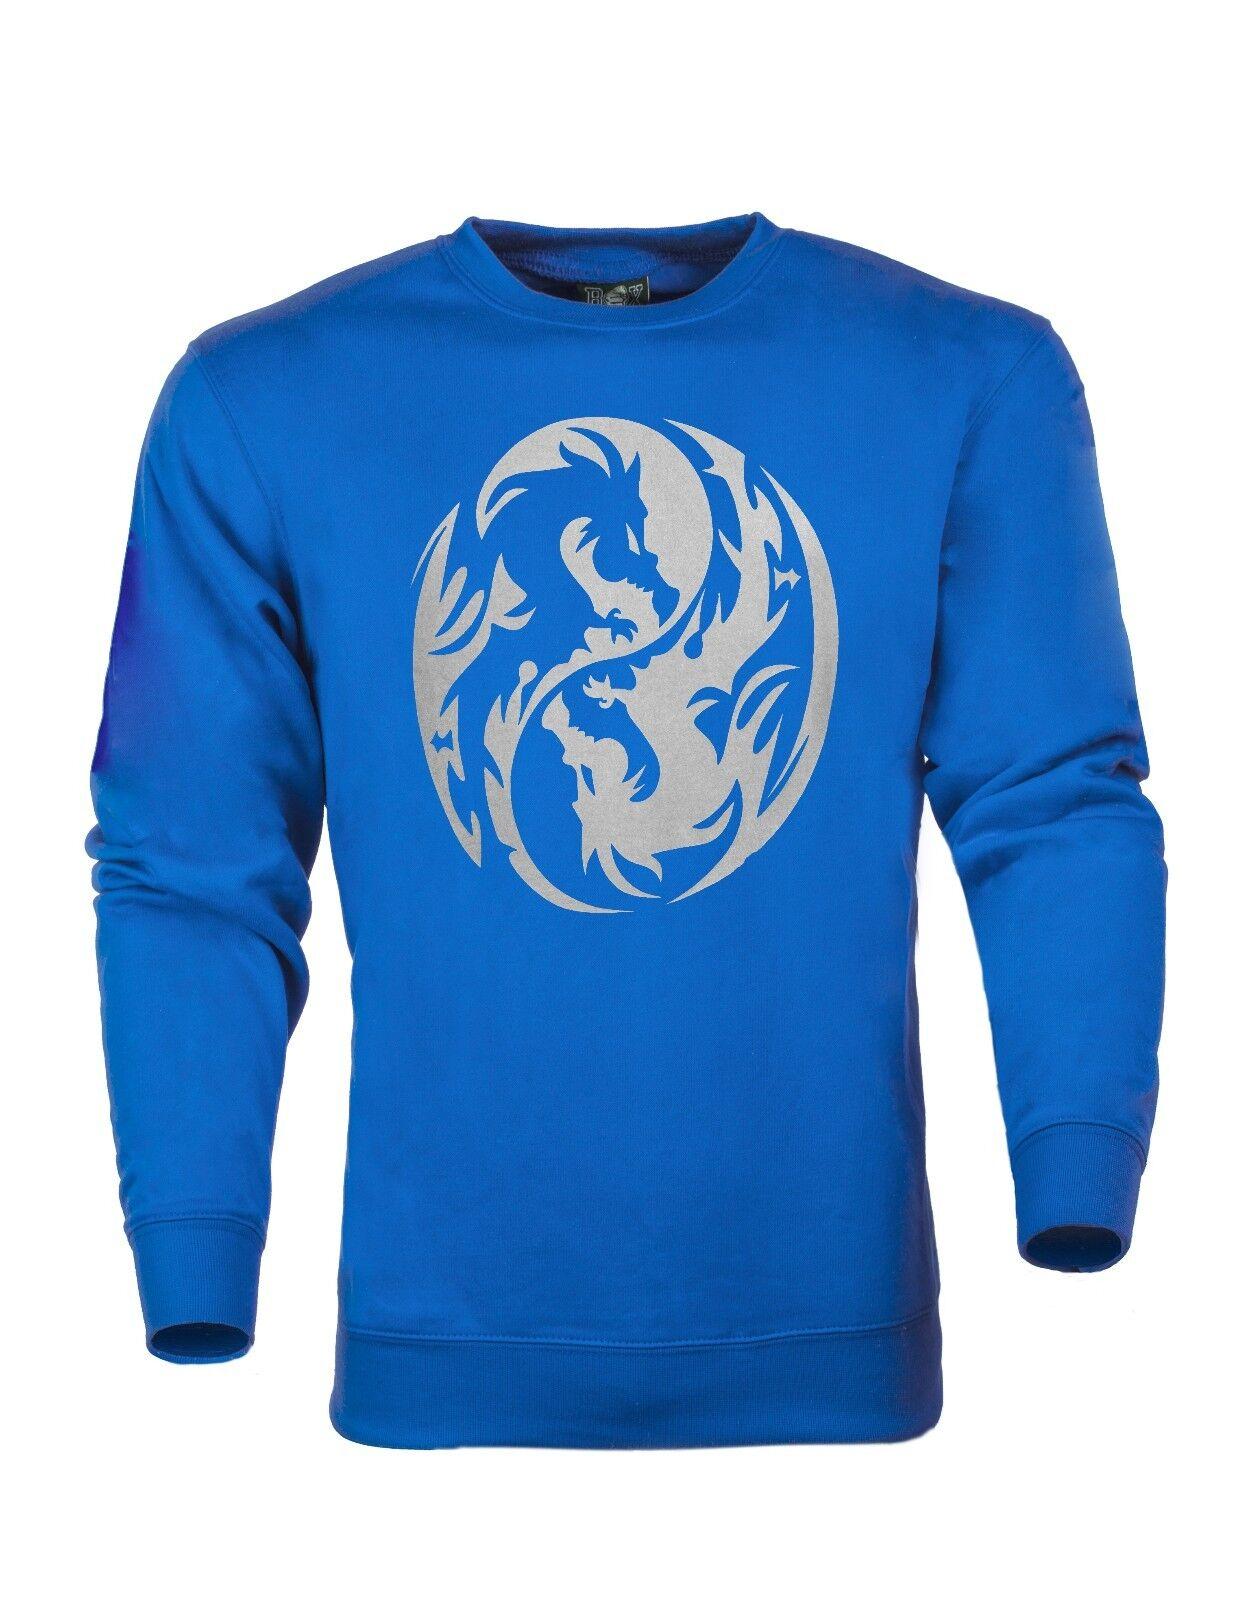 Ying Yang Symbol Silver Logo Dragon Hoodie Sweatshirt S 3XL